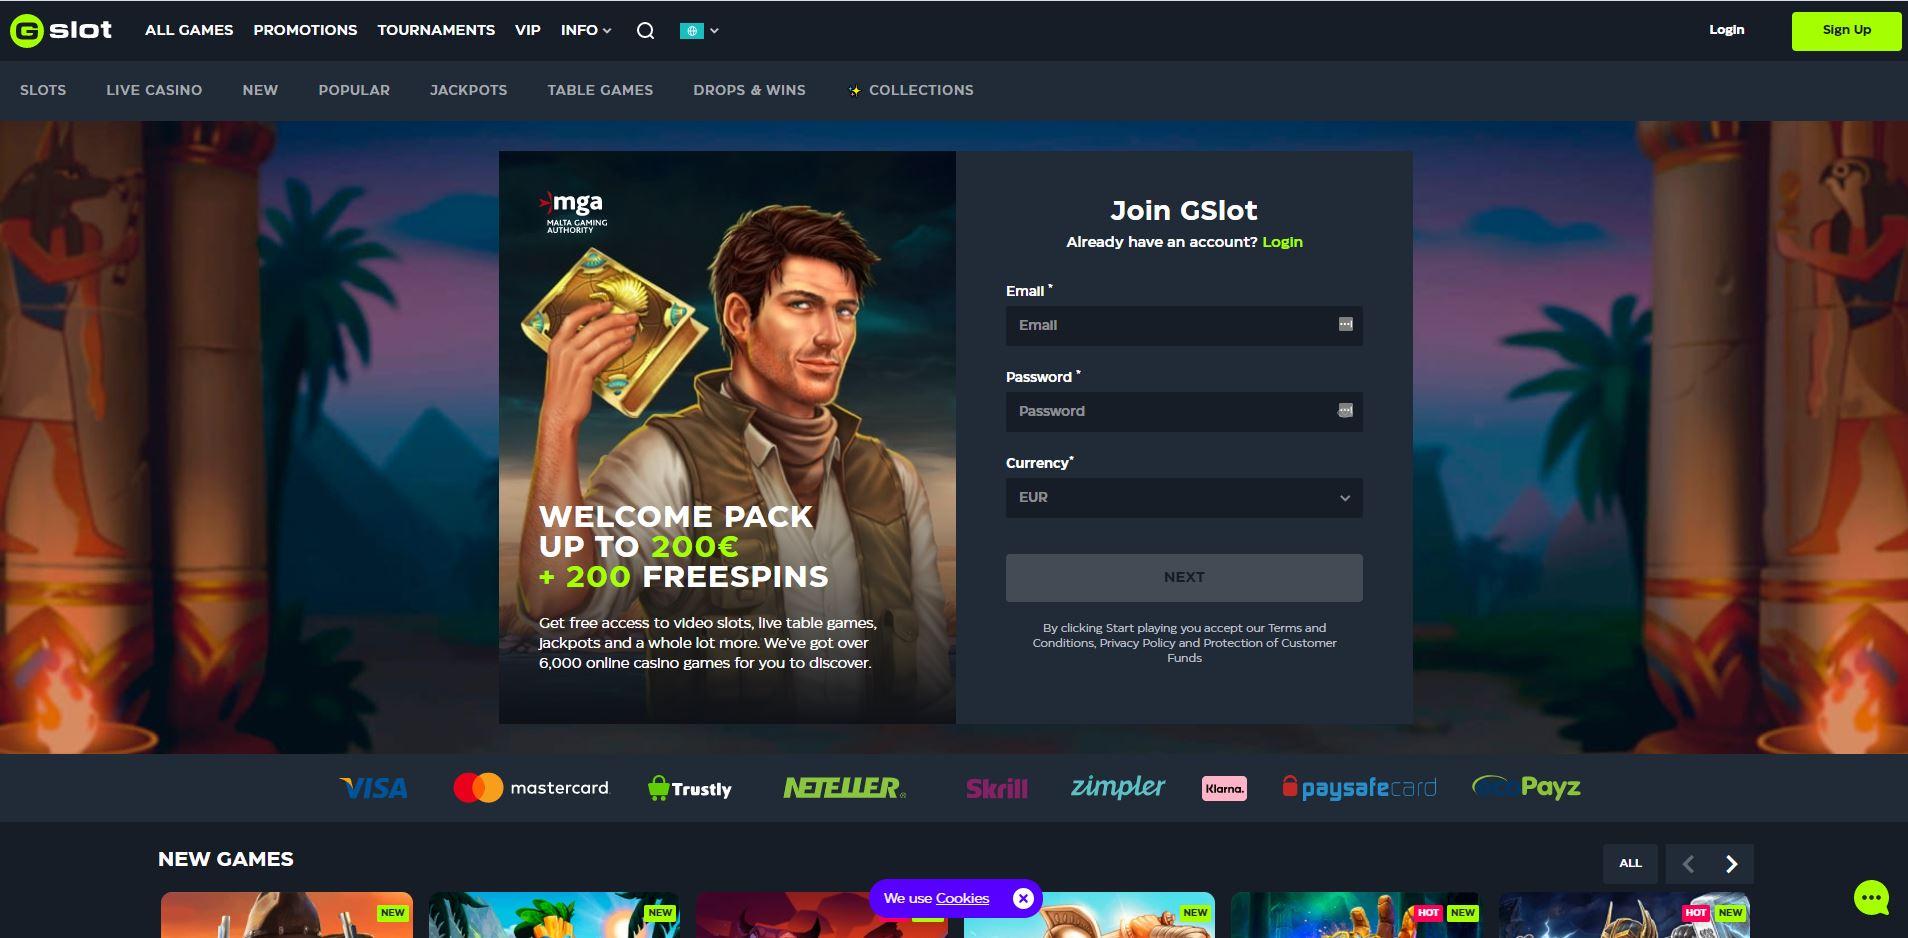 Gslot Casino Homepage Screenshot